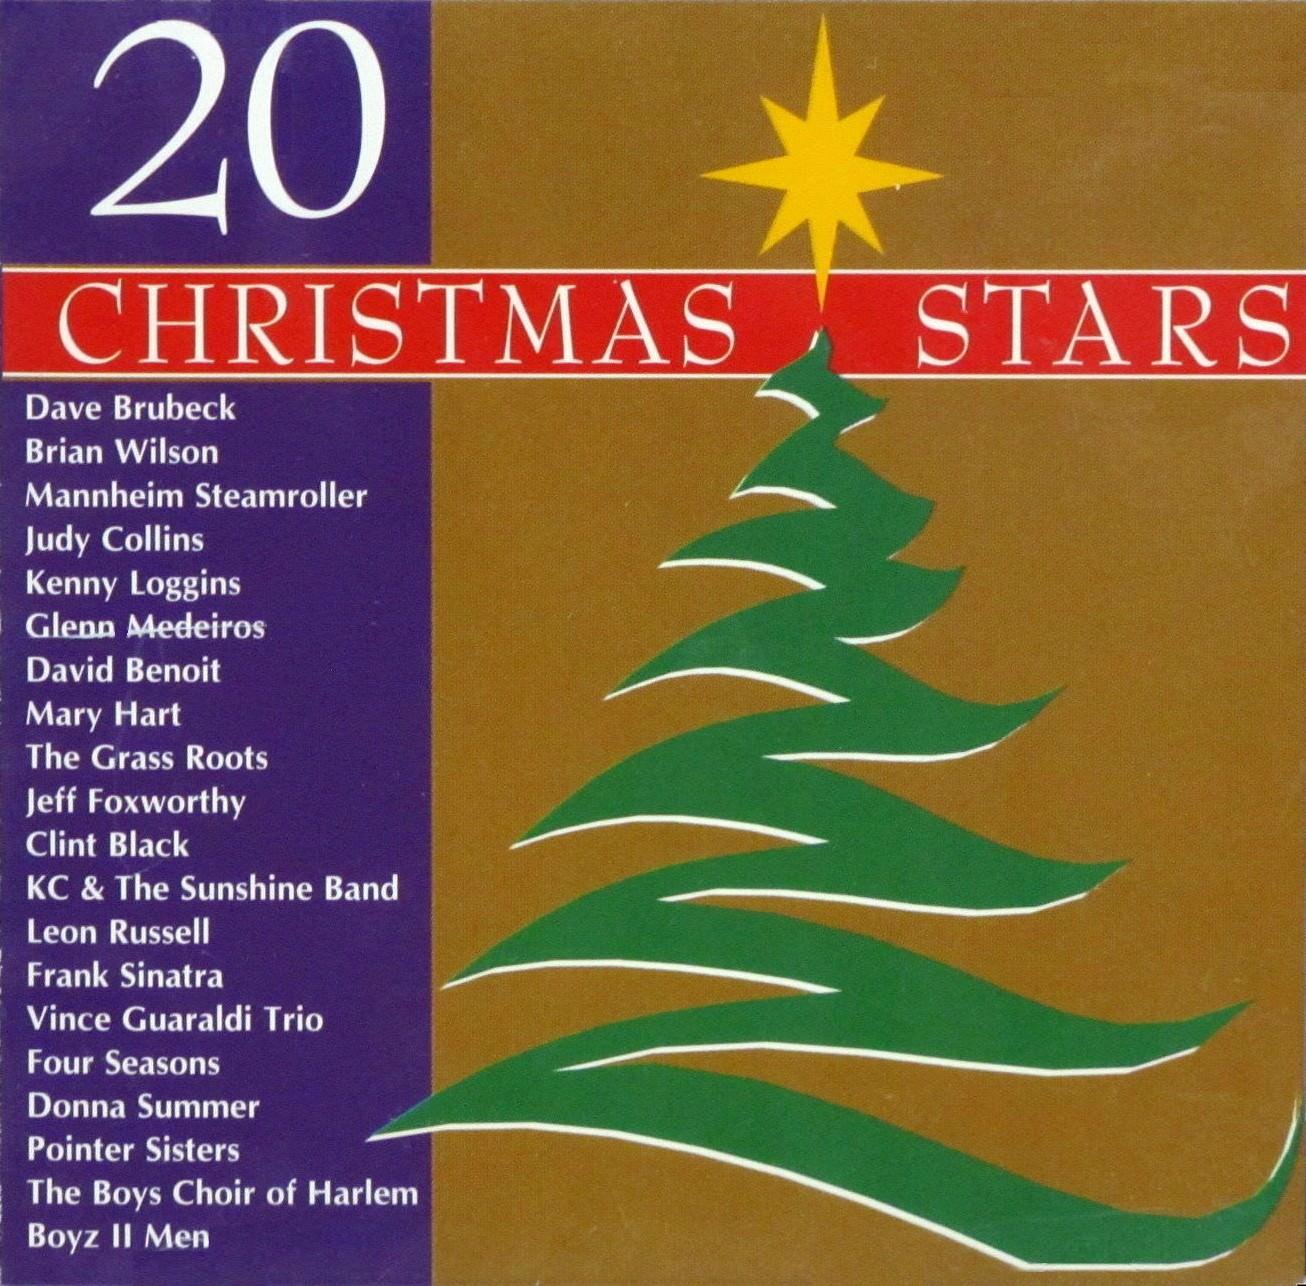 20 Christmas Stars III cover